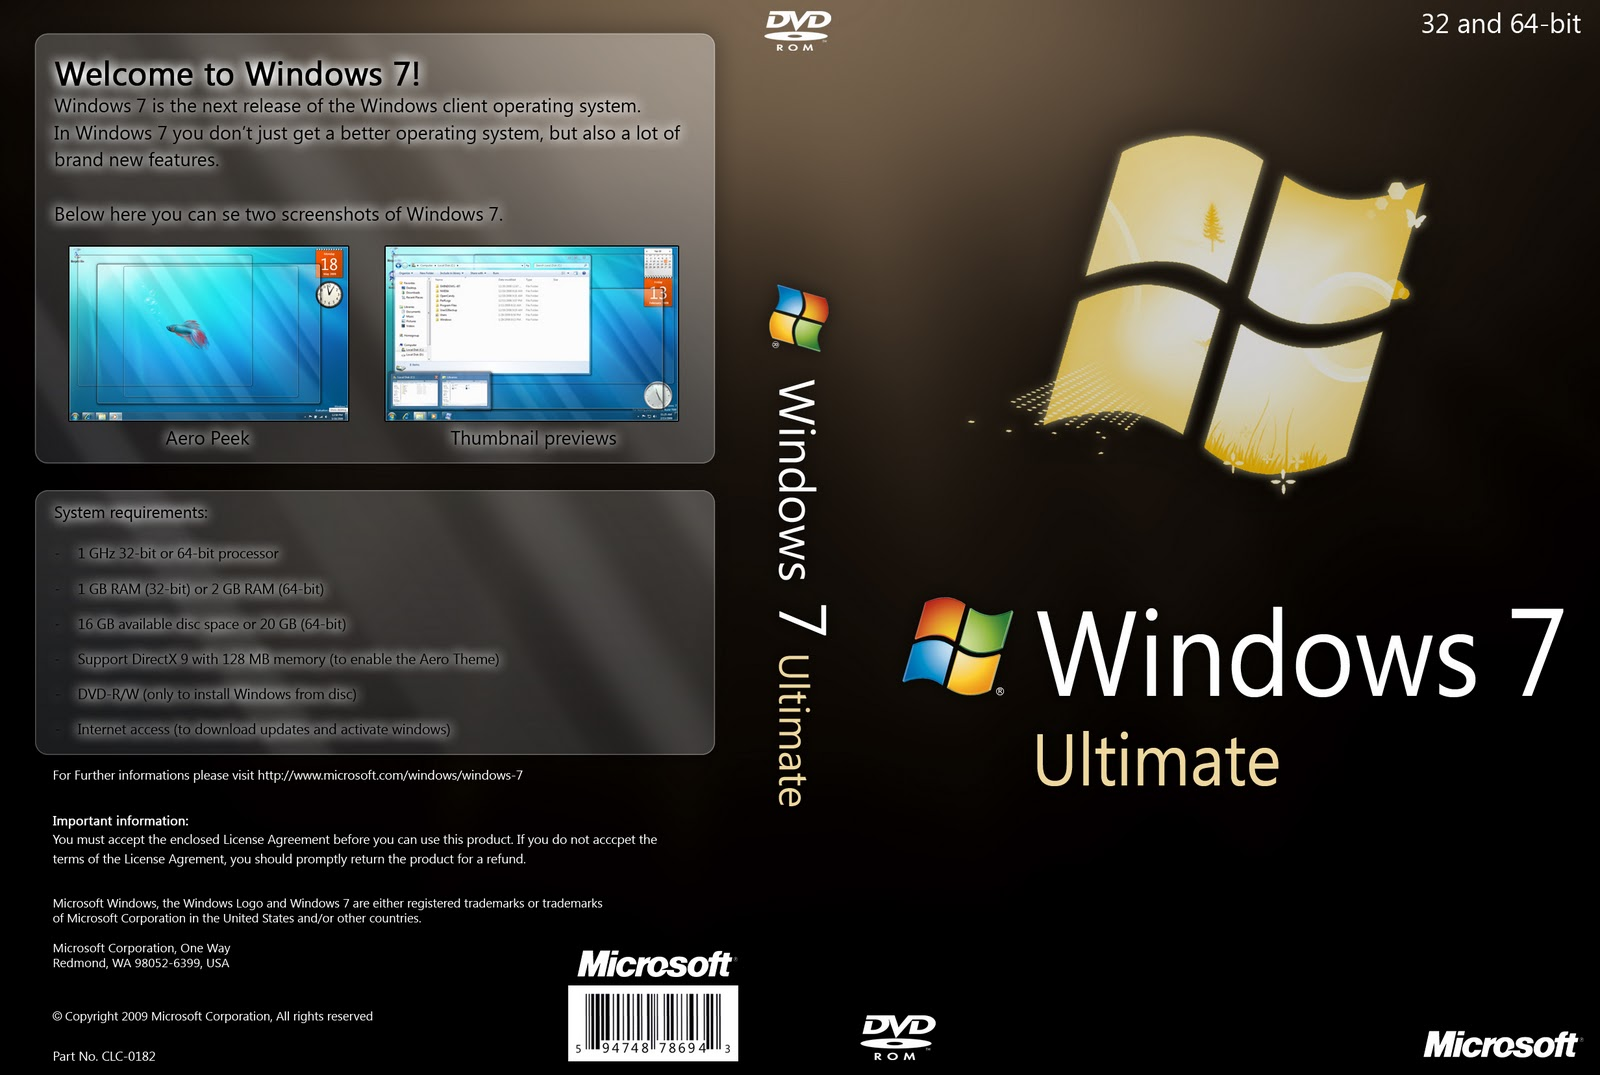 win 7 ultimate 64 bit torrent